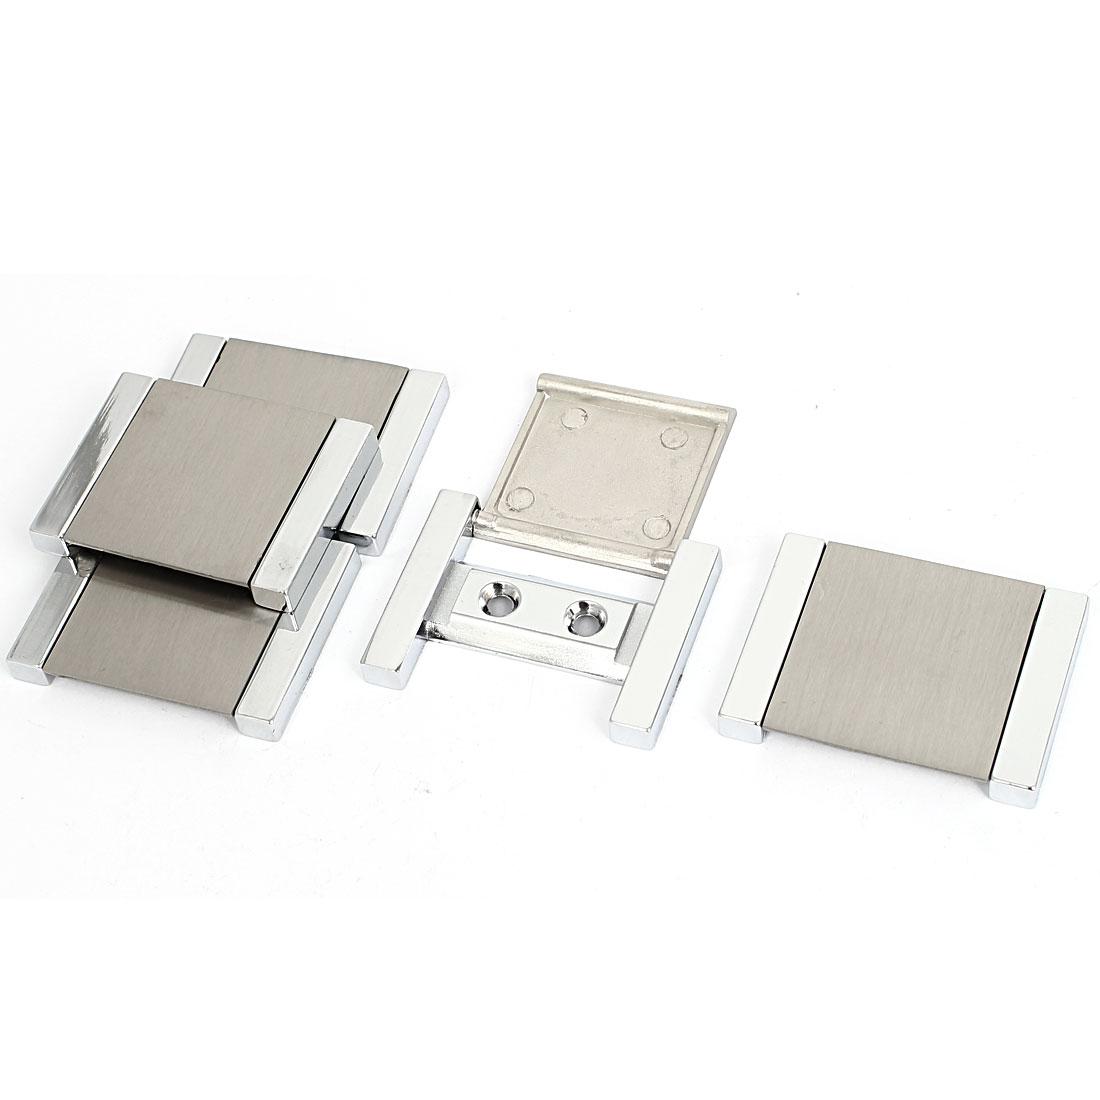 Cabinet Drawer Zinc Alloy Rectangle Pull Handle 4cm x 5cm 5pcs